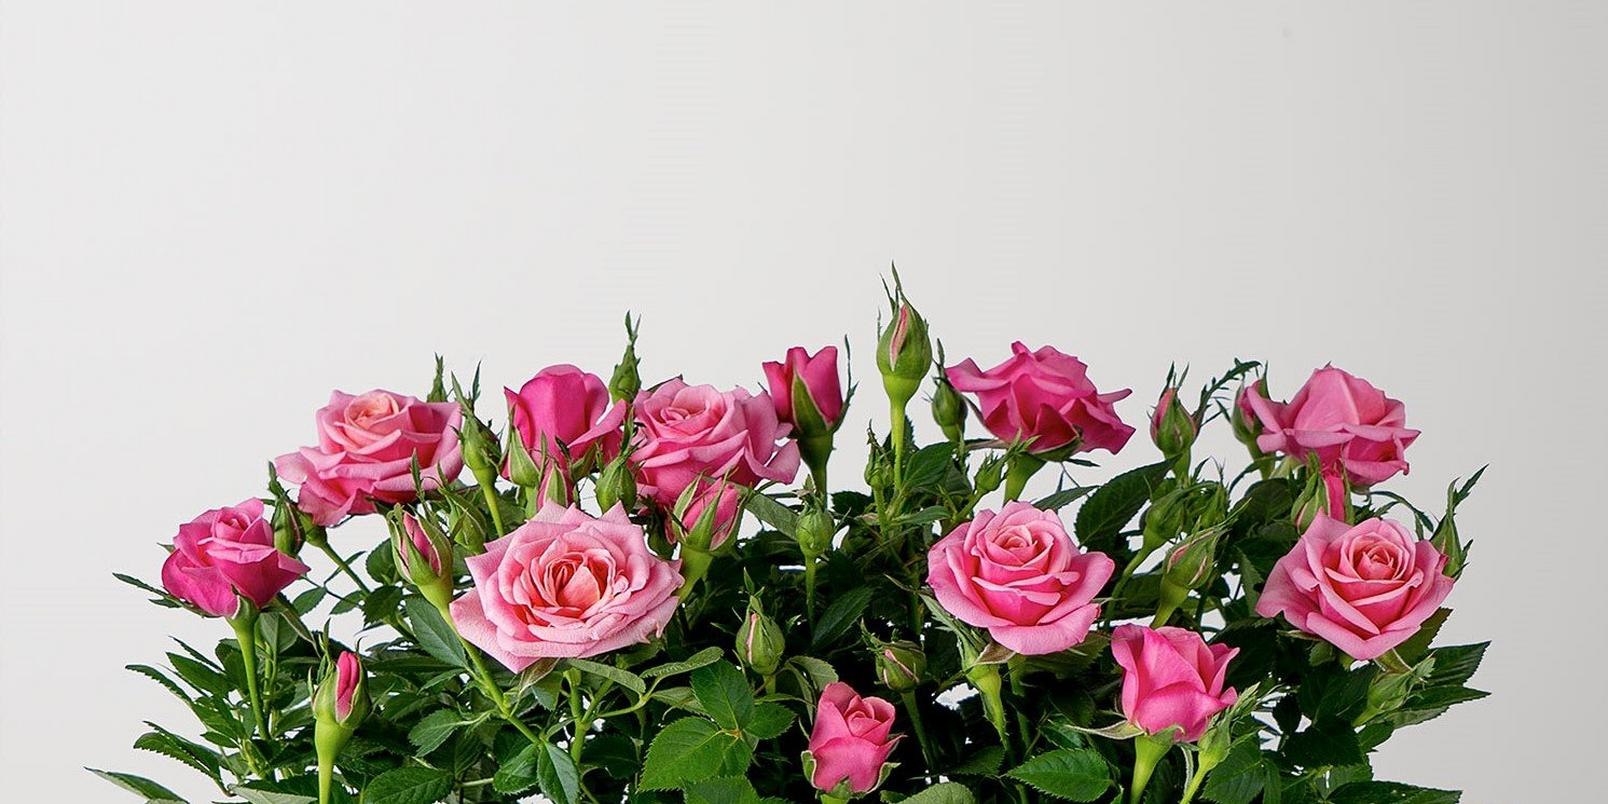 rose-plants